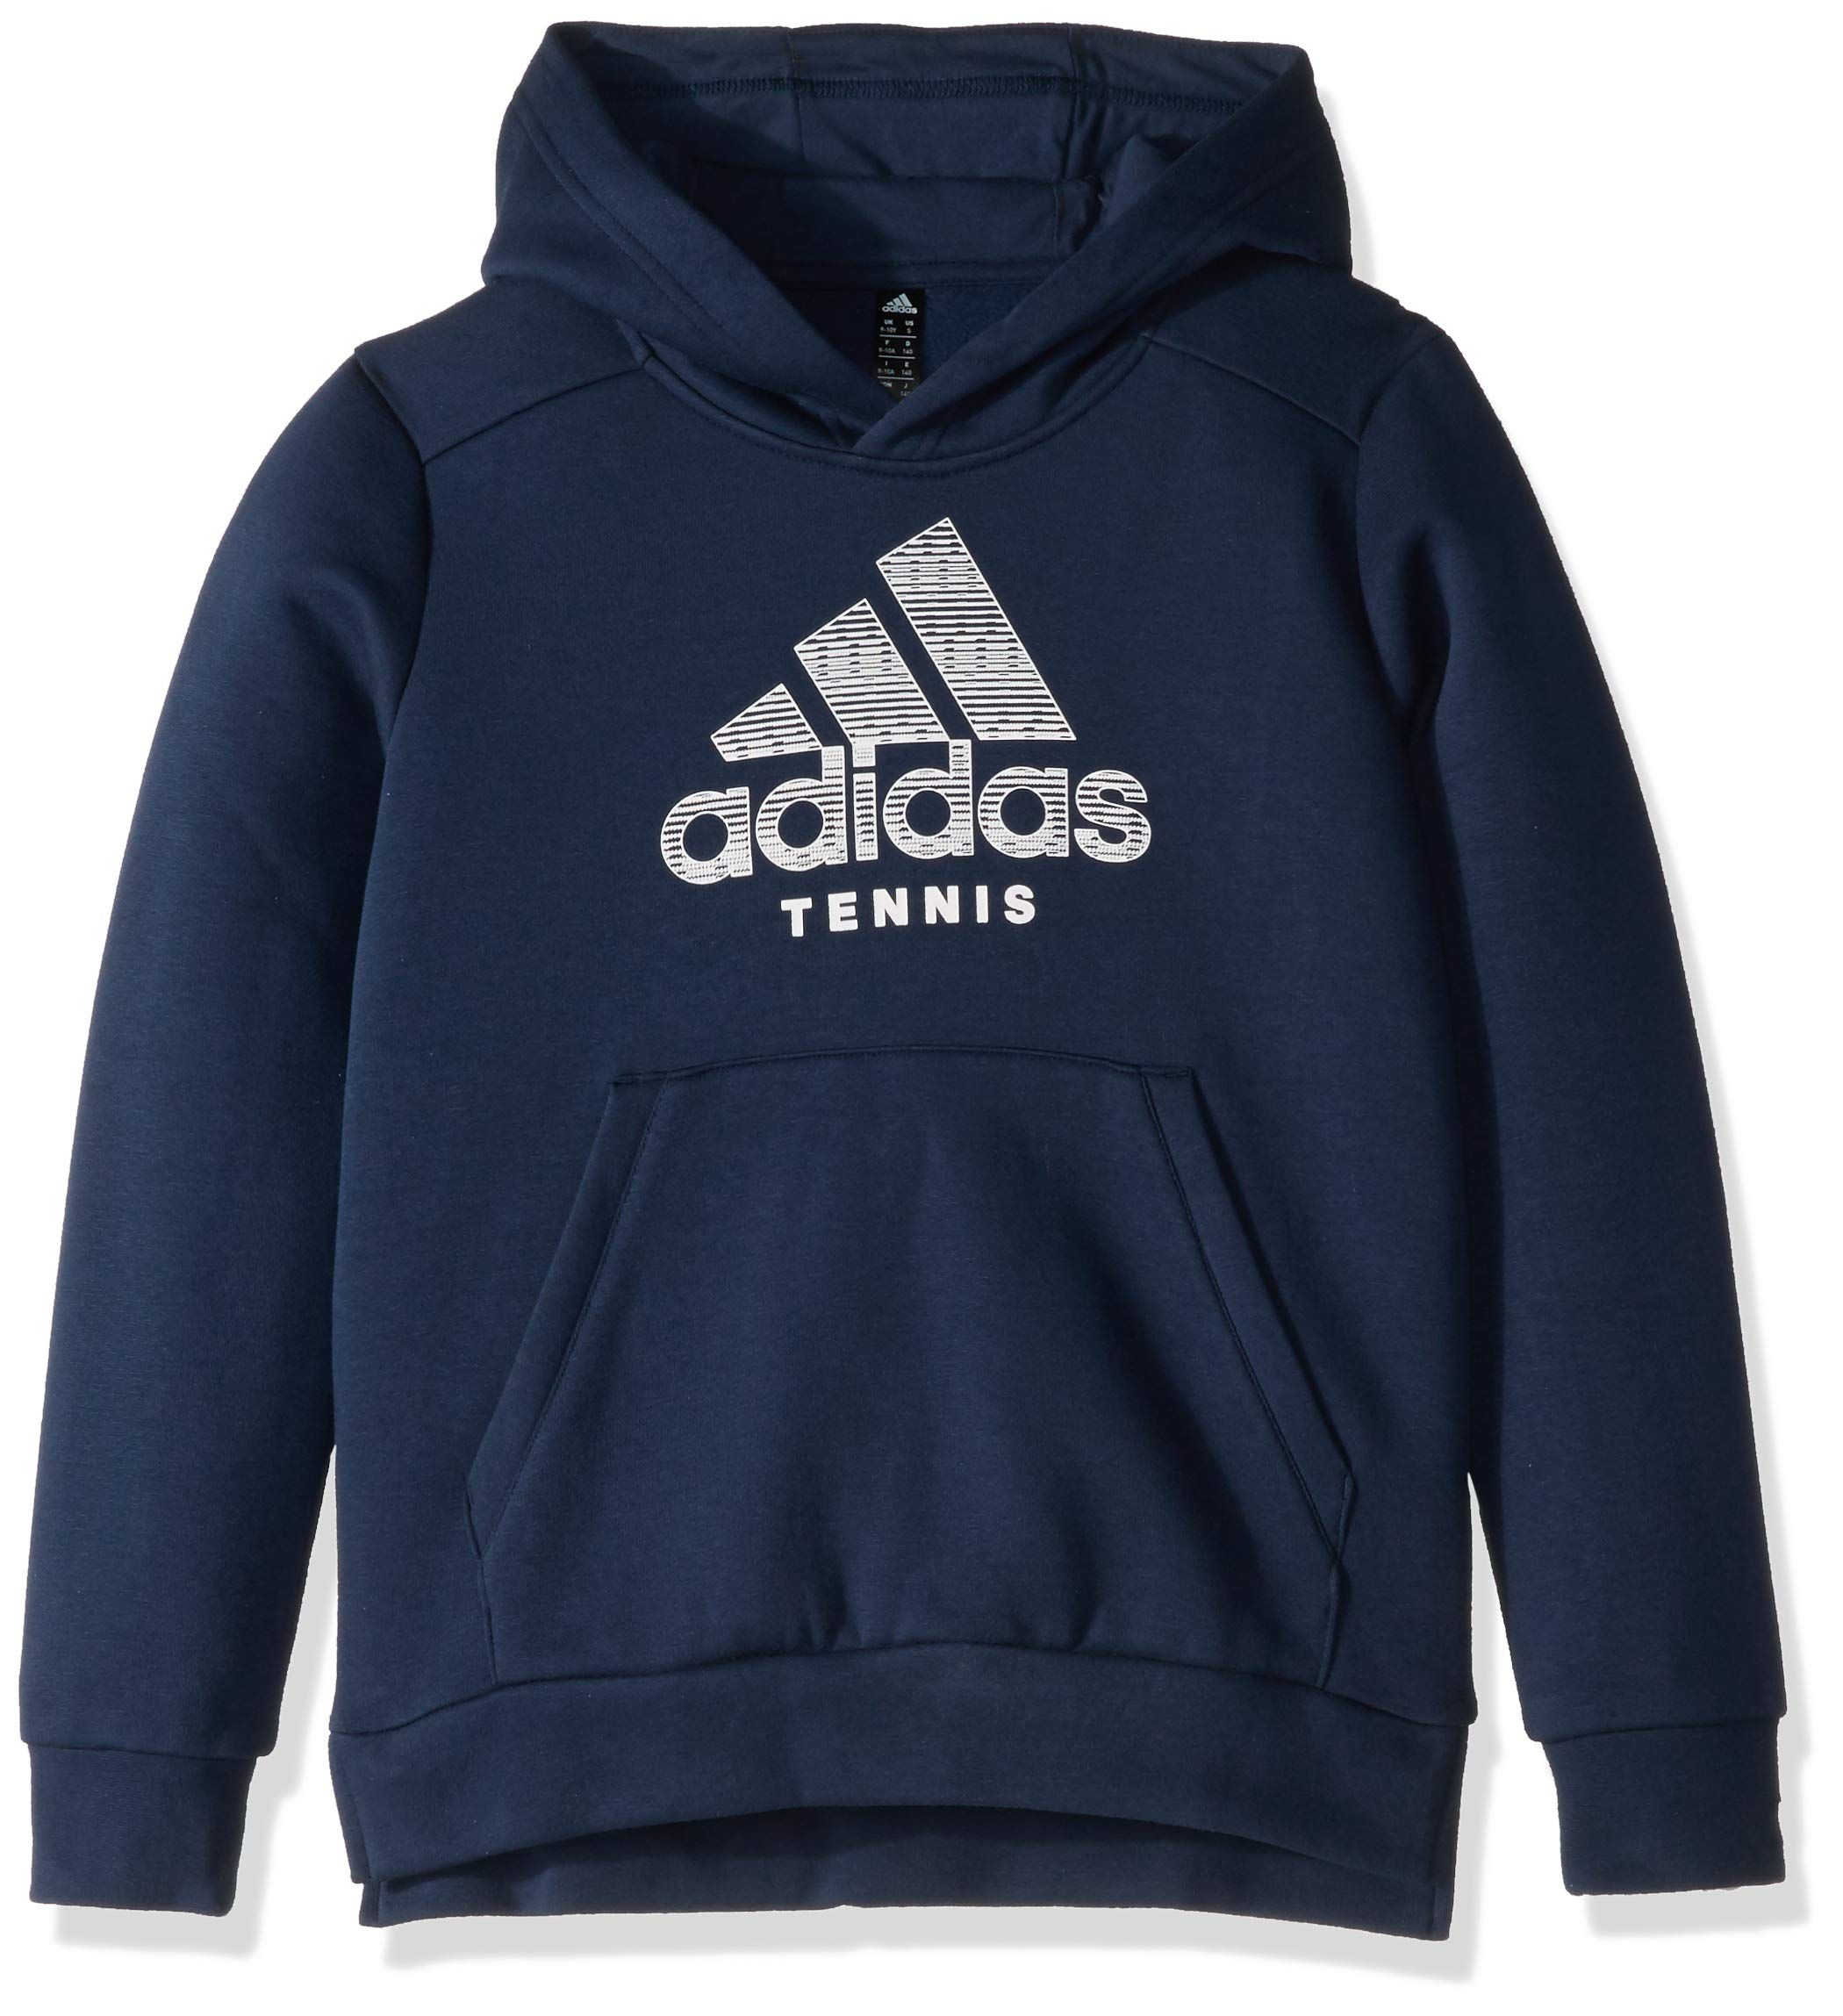 adidas Kids Club Hooded Tennis Sweatshirt, Collegiate Navy/White, X-Small